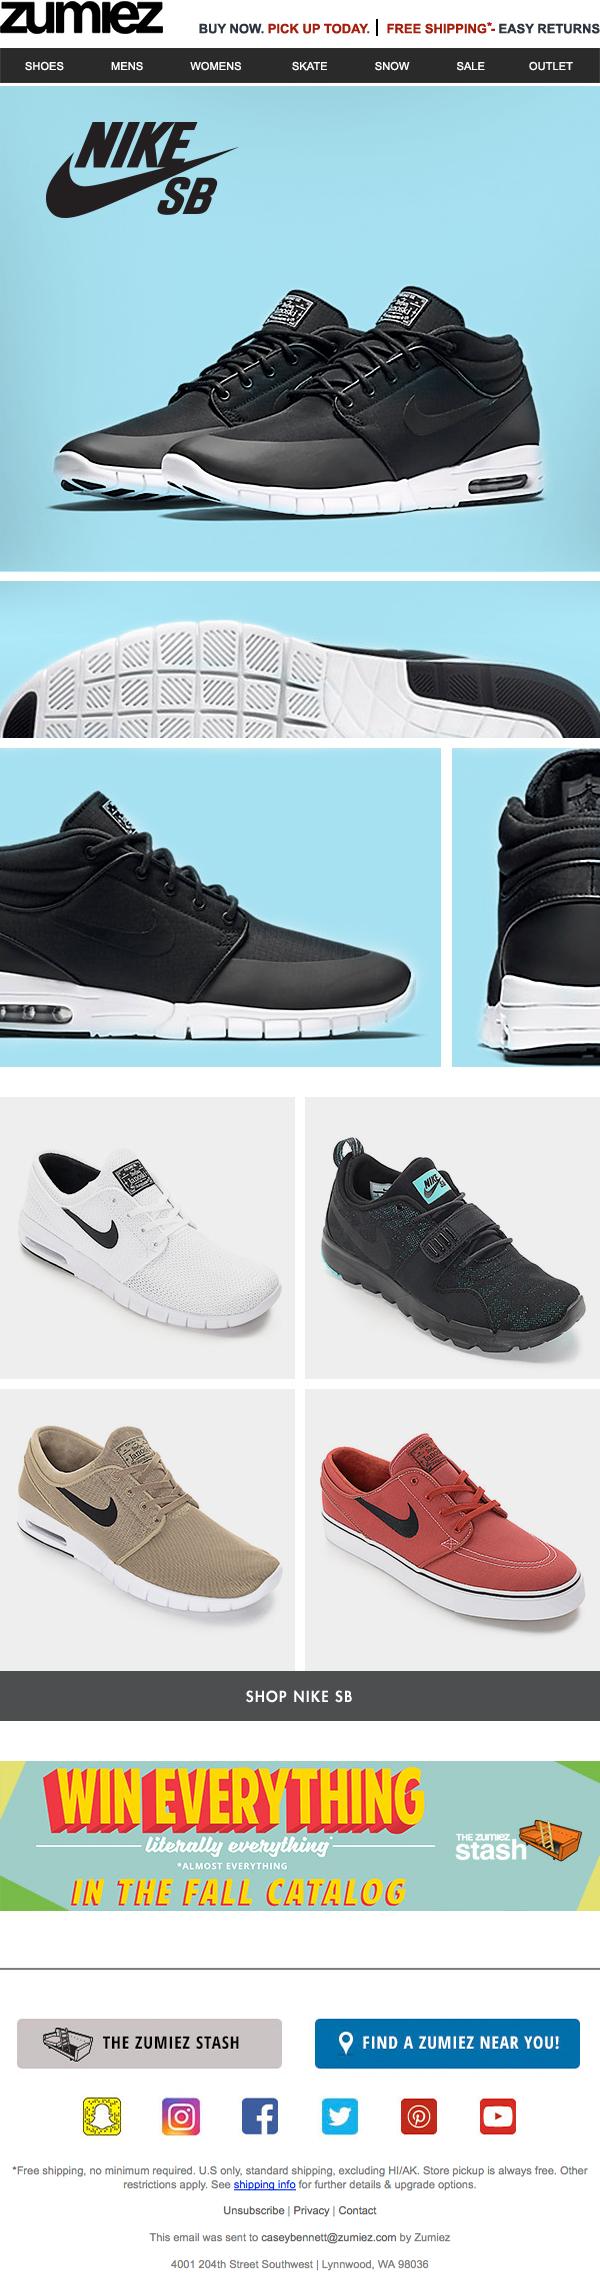 Adidas skate shoes zumiez - Custom Email Marketing Campaigns